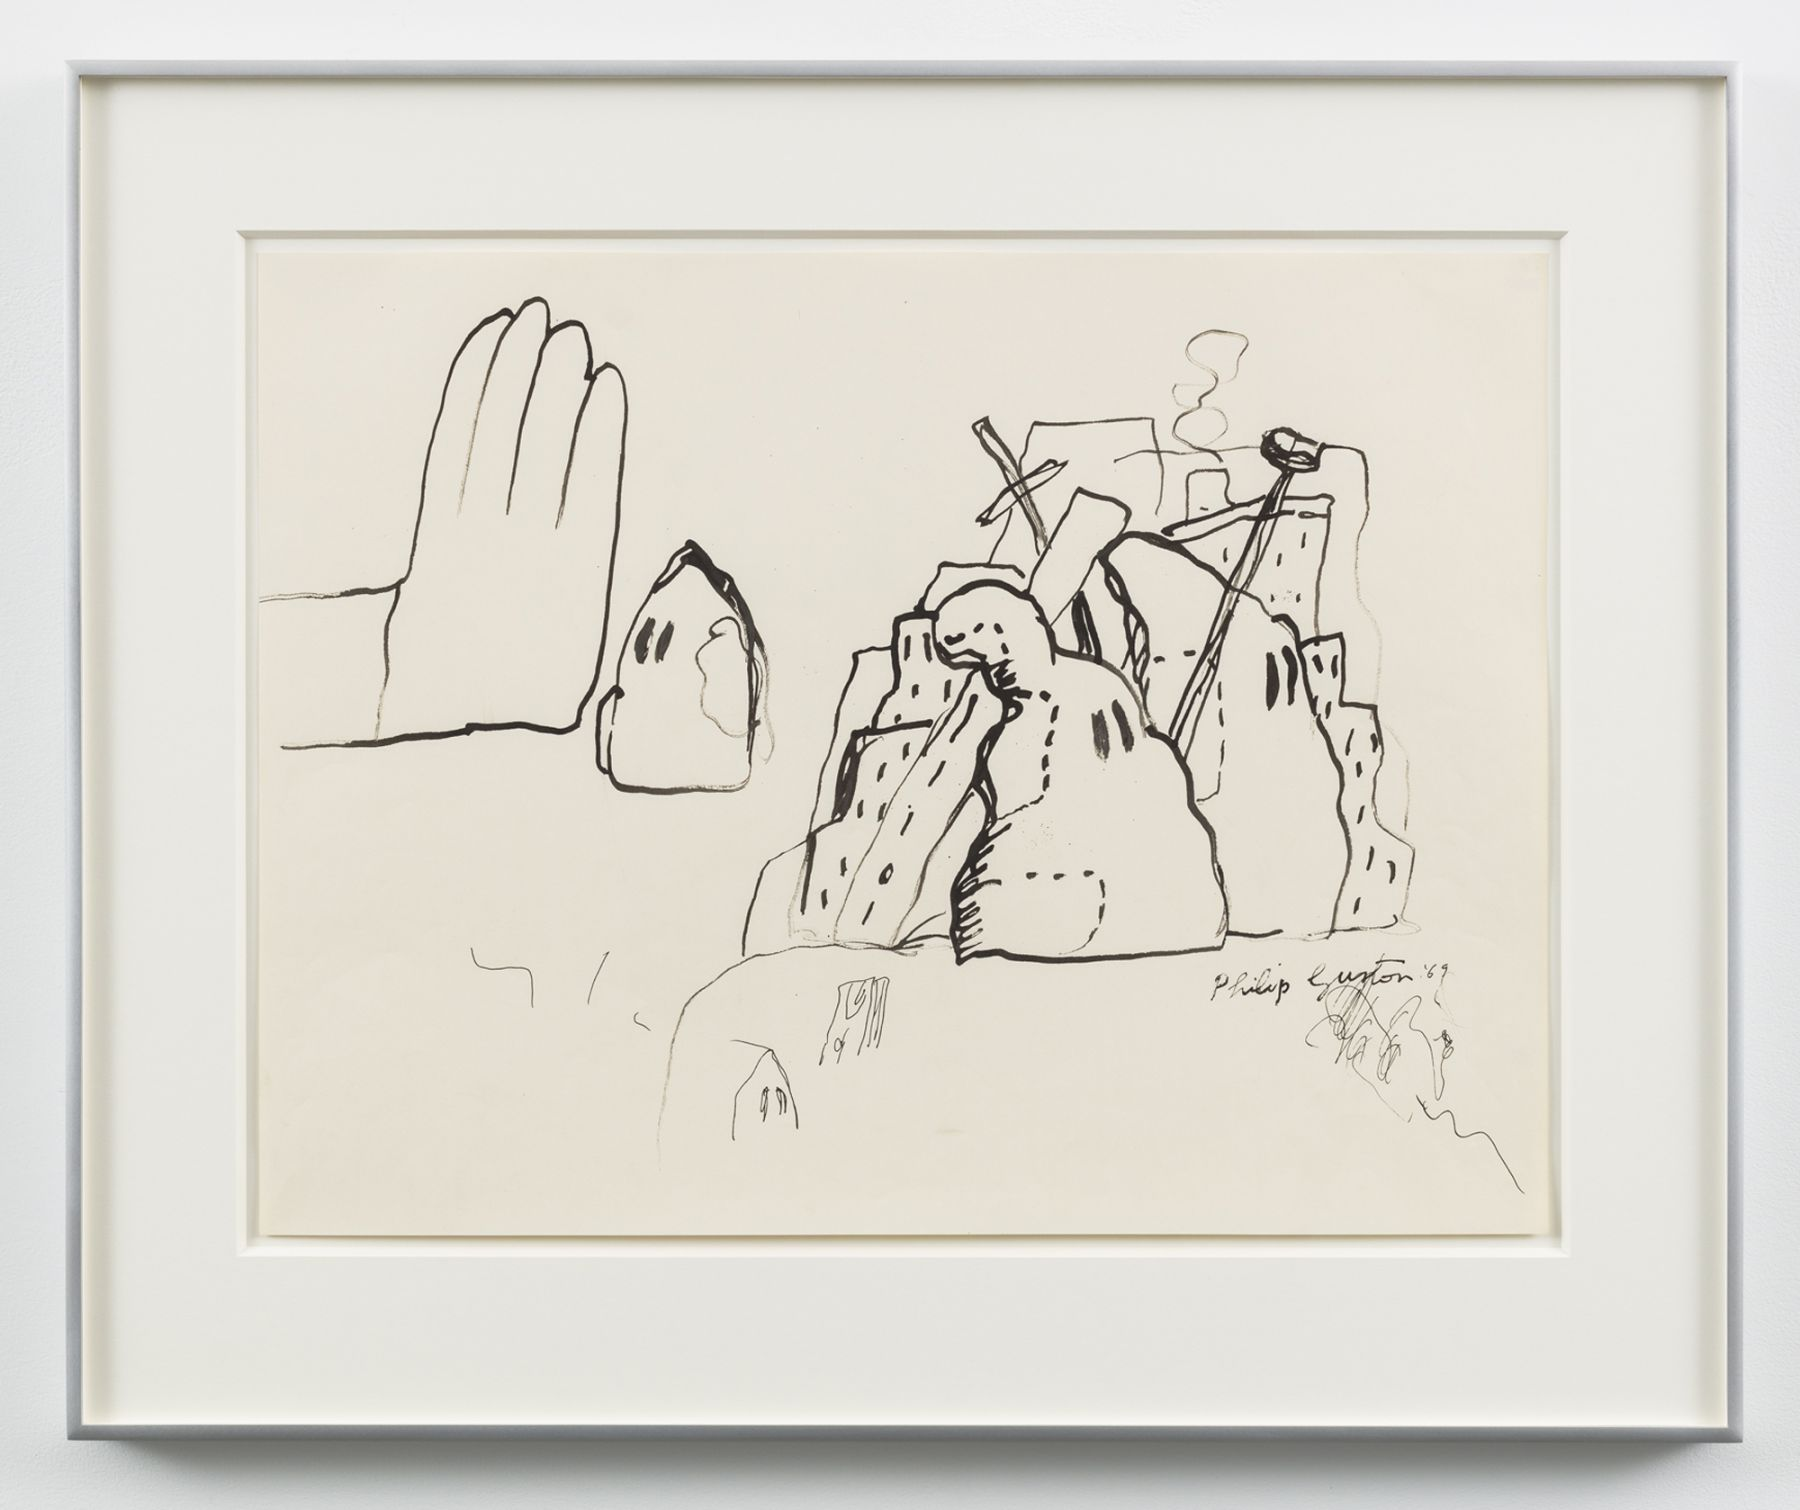 Philip Guston, Untitled